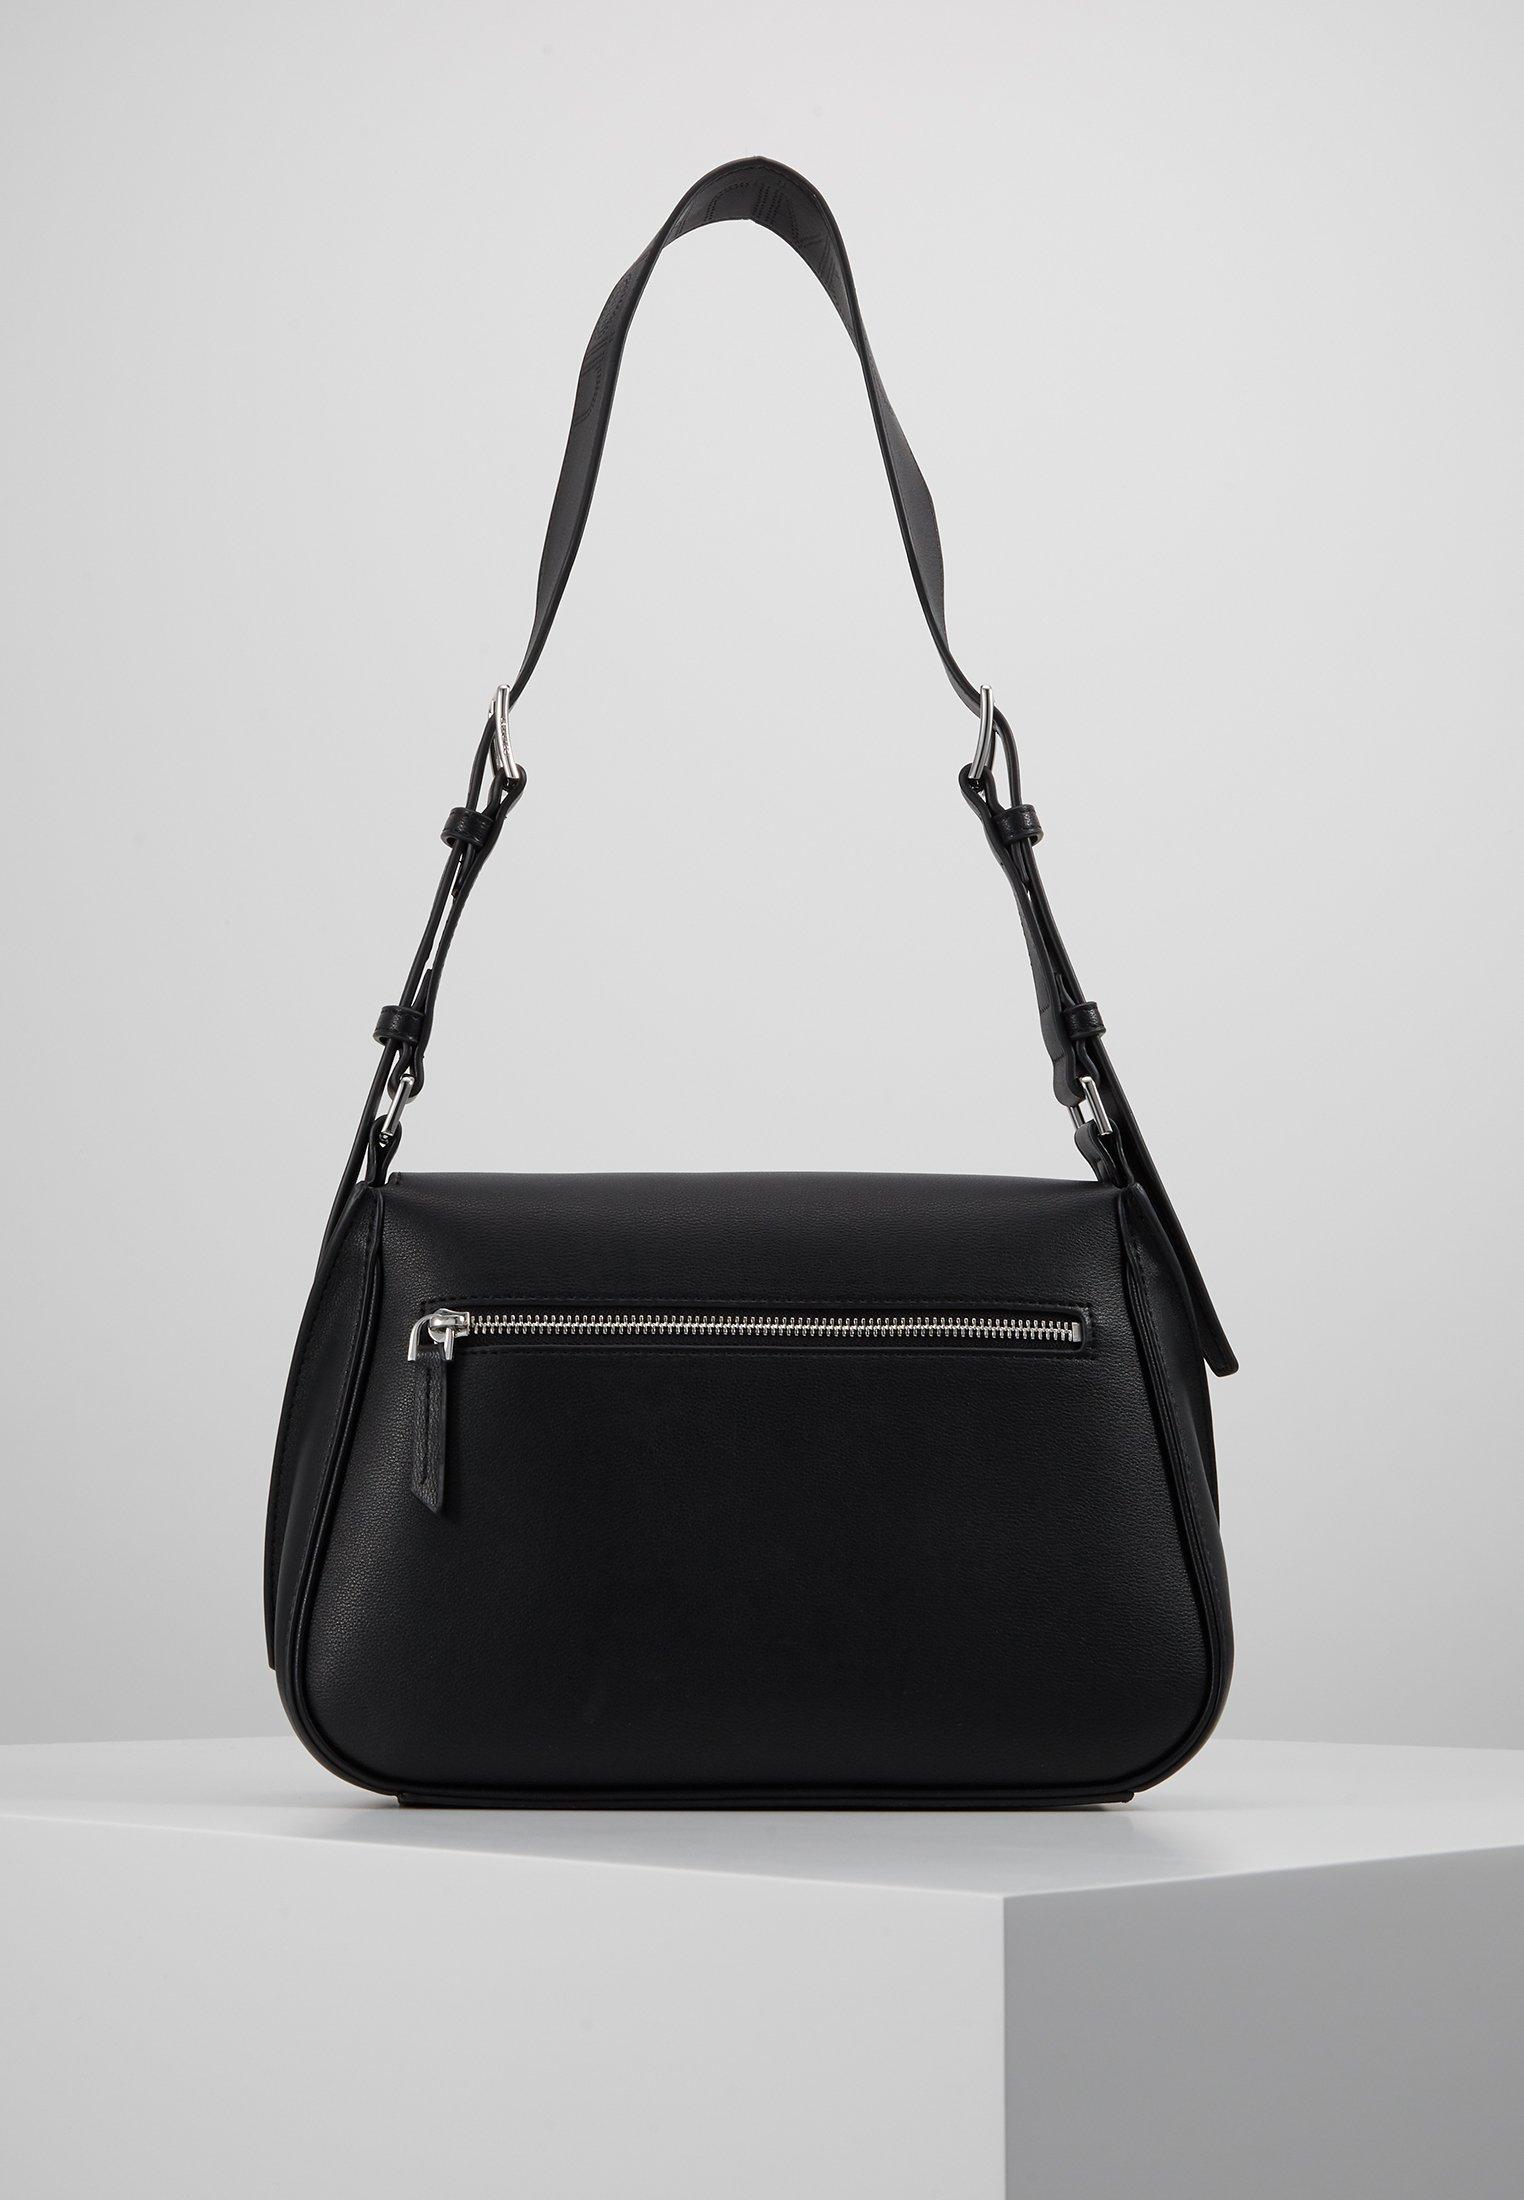 Calvin Klein Punched Satchel - Across Body Bag Black